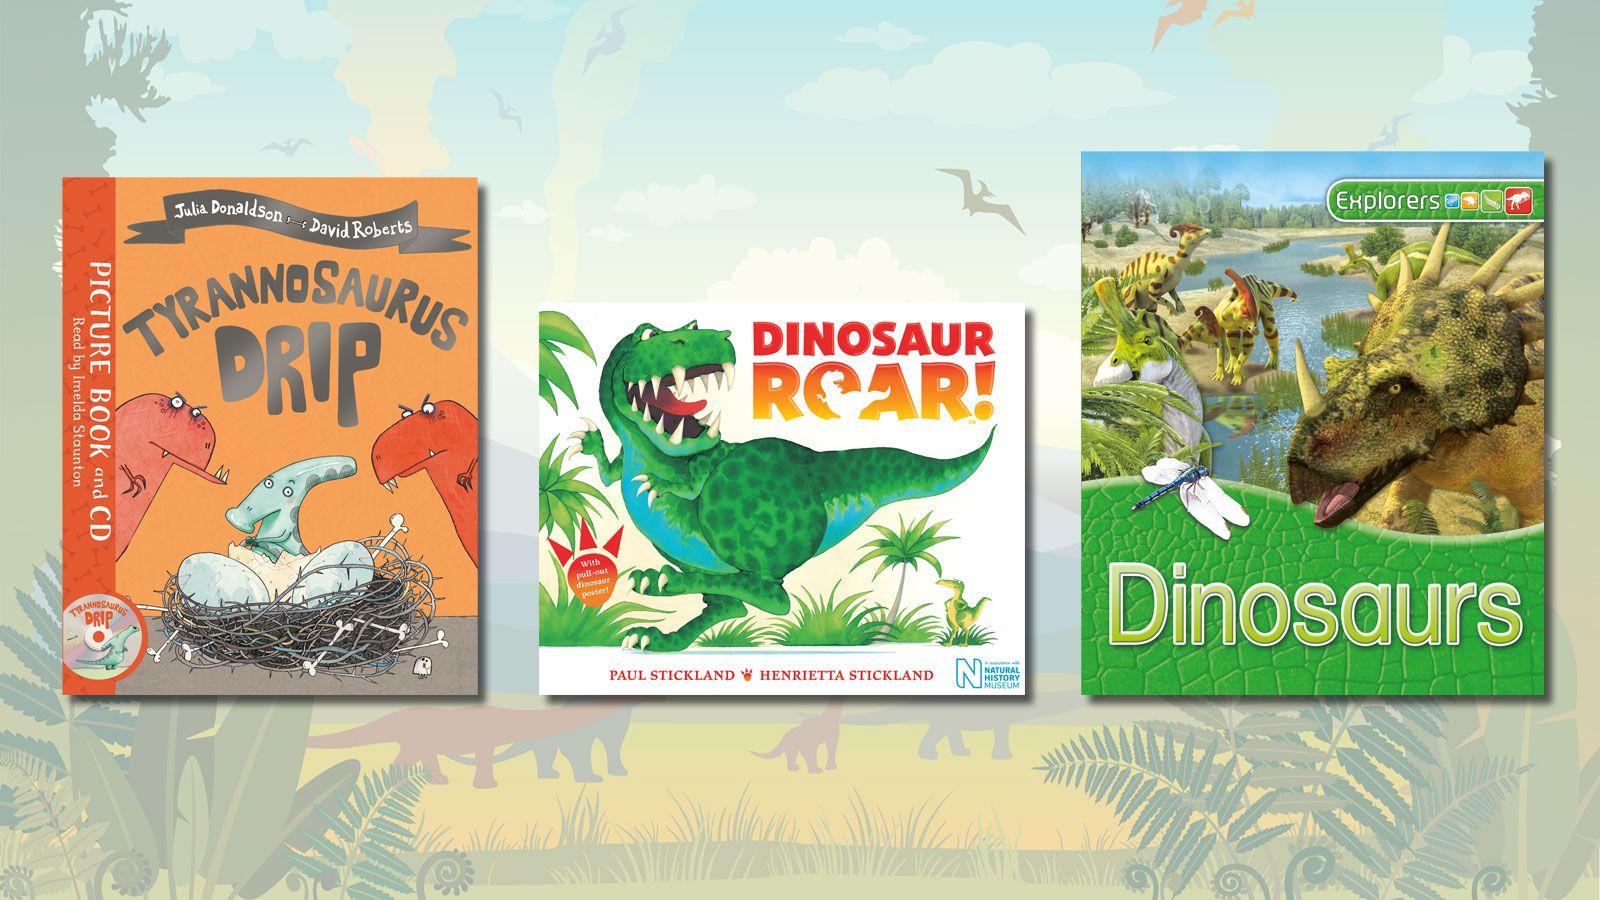 Book covers of Tyrannosaurus Drip, Dinosaur Roar! and Explorers: Dinosaurs